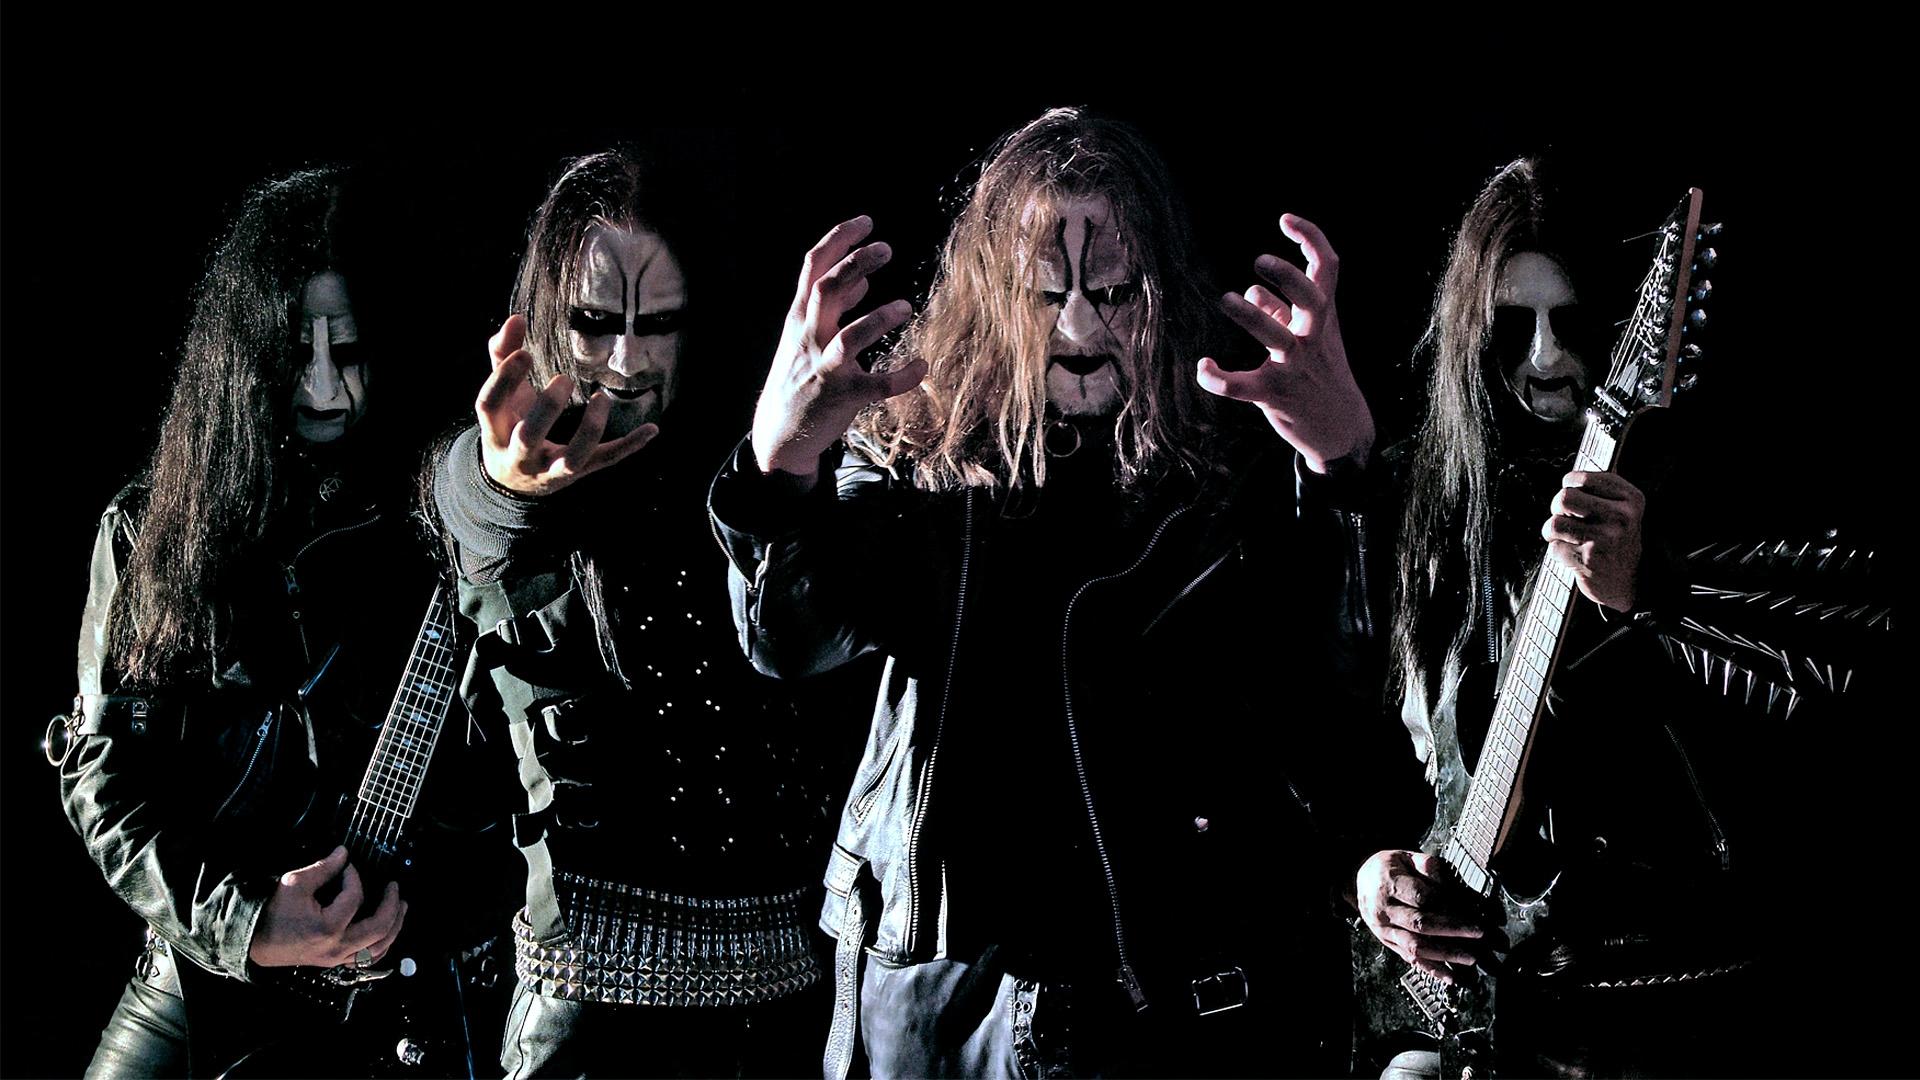 Wallpaper Dark Funeral Band Image Hands Makeup